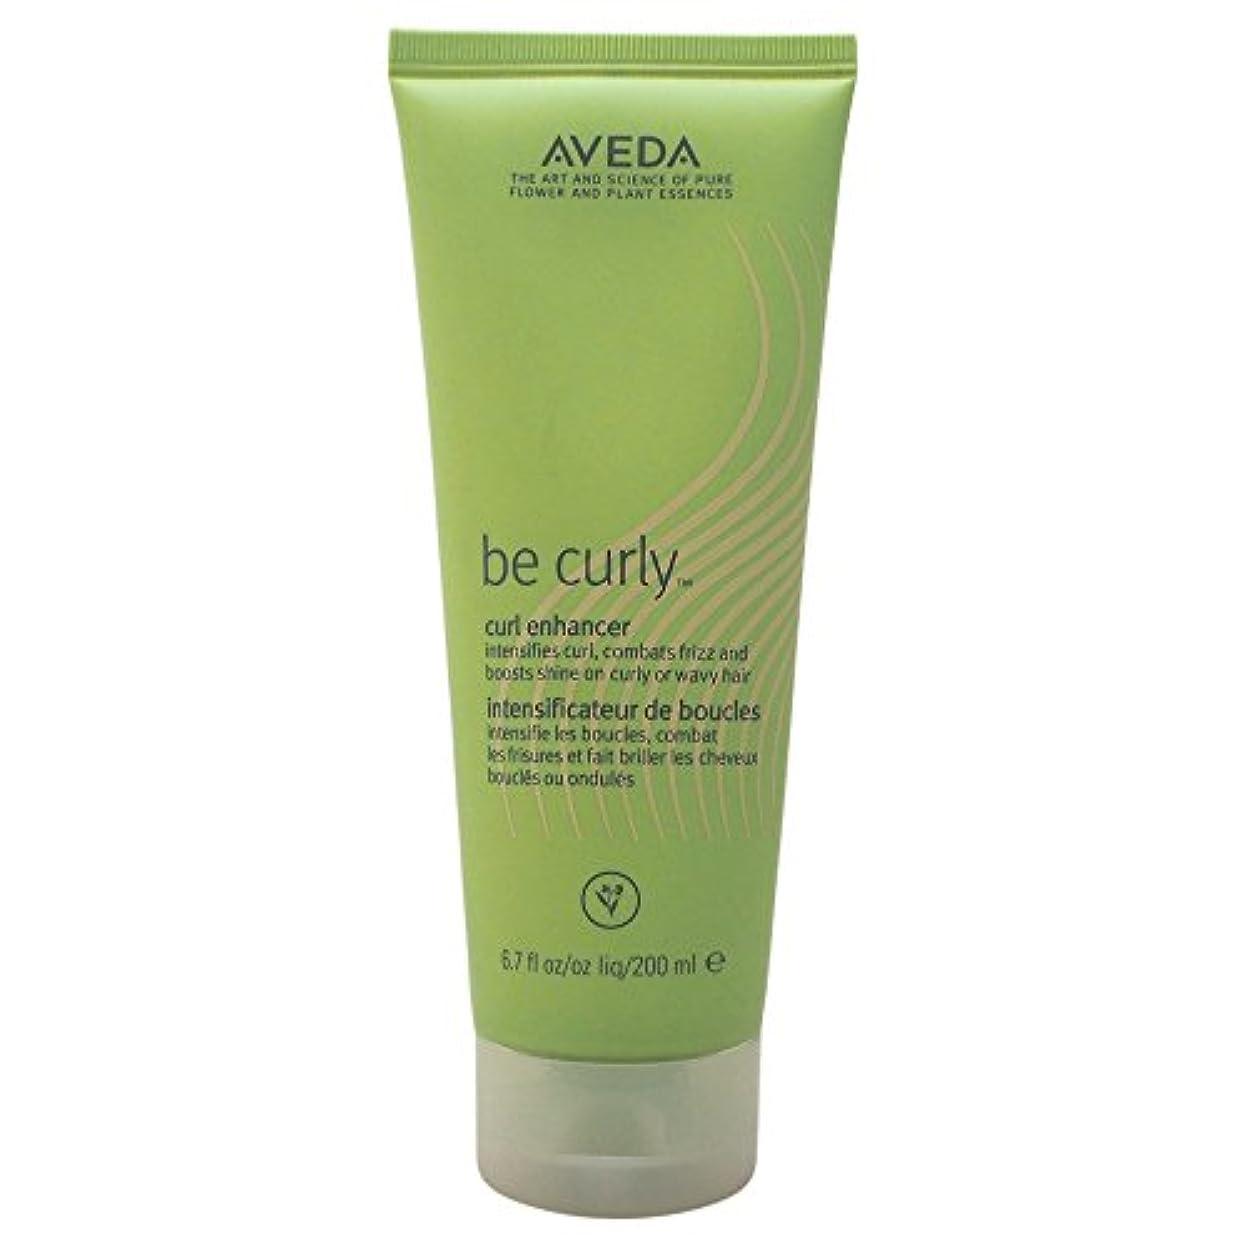 Aveda Be Curly Curl Enhancing Lotion 200ml [並行輸入品]